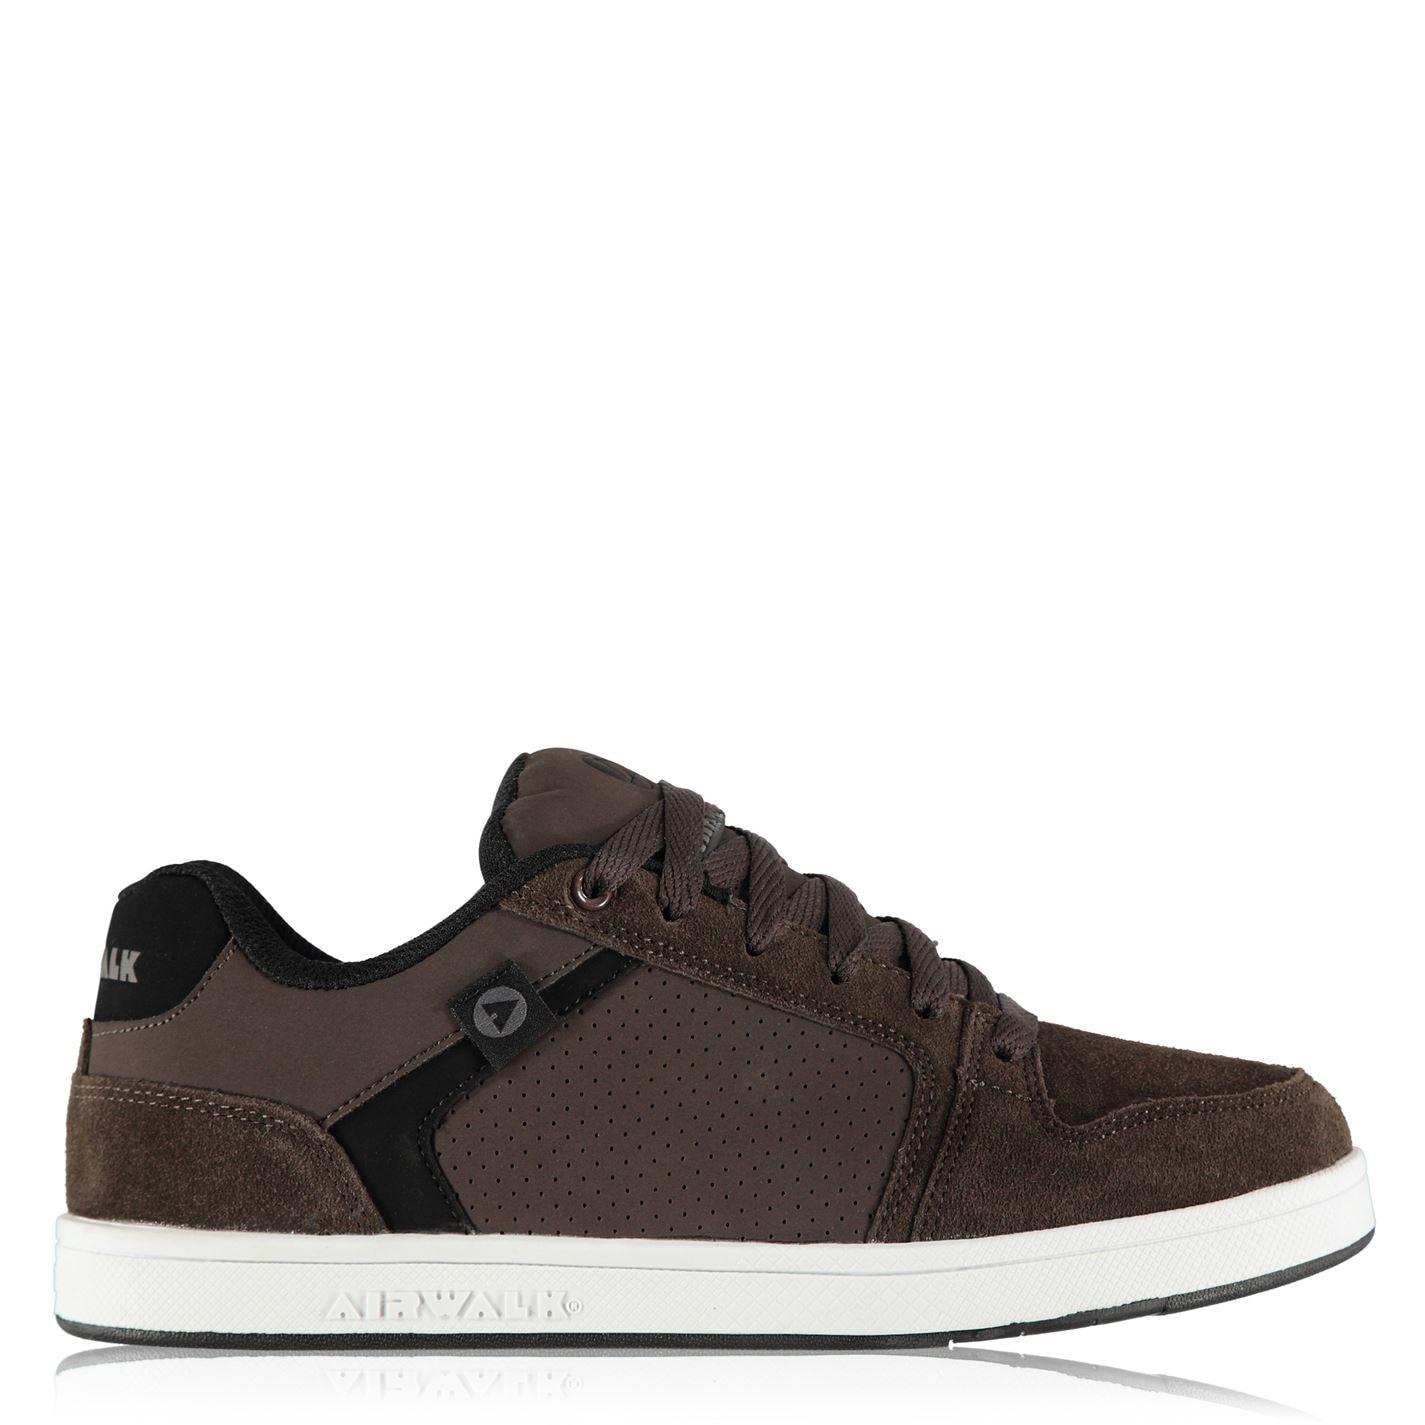 Airwalk Brock Mens Skate Shoes Brown 0b60c0c702